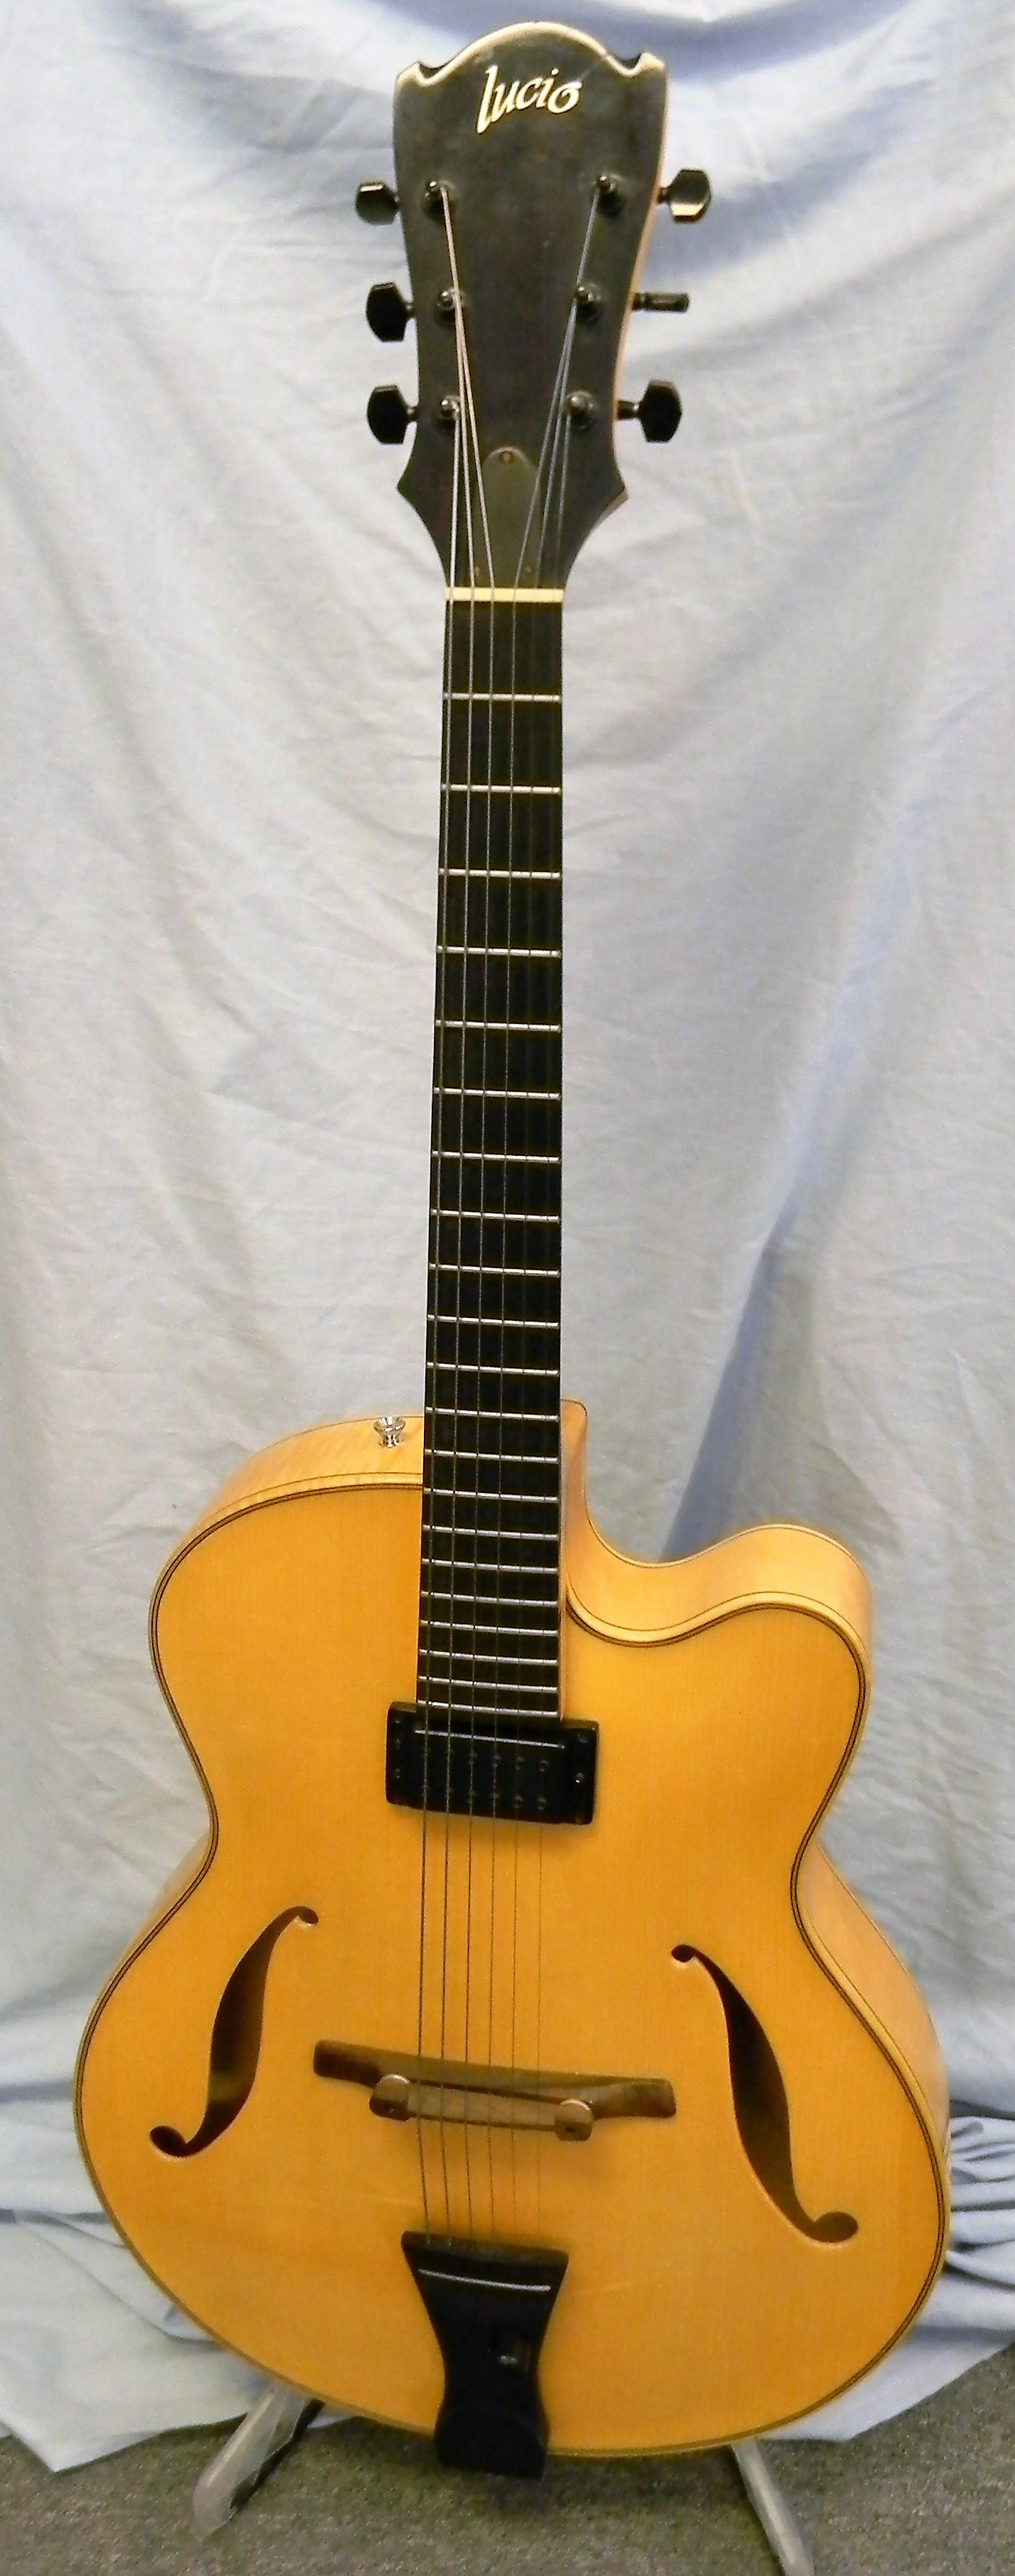 dscn2482 san antonio guitar store guitar tex. Black Bedroom Furniture Sets. Home Design Ideas